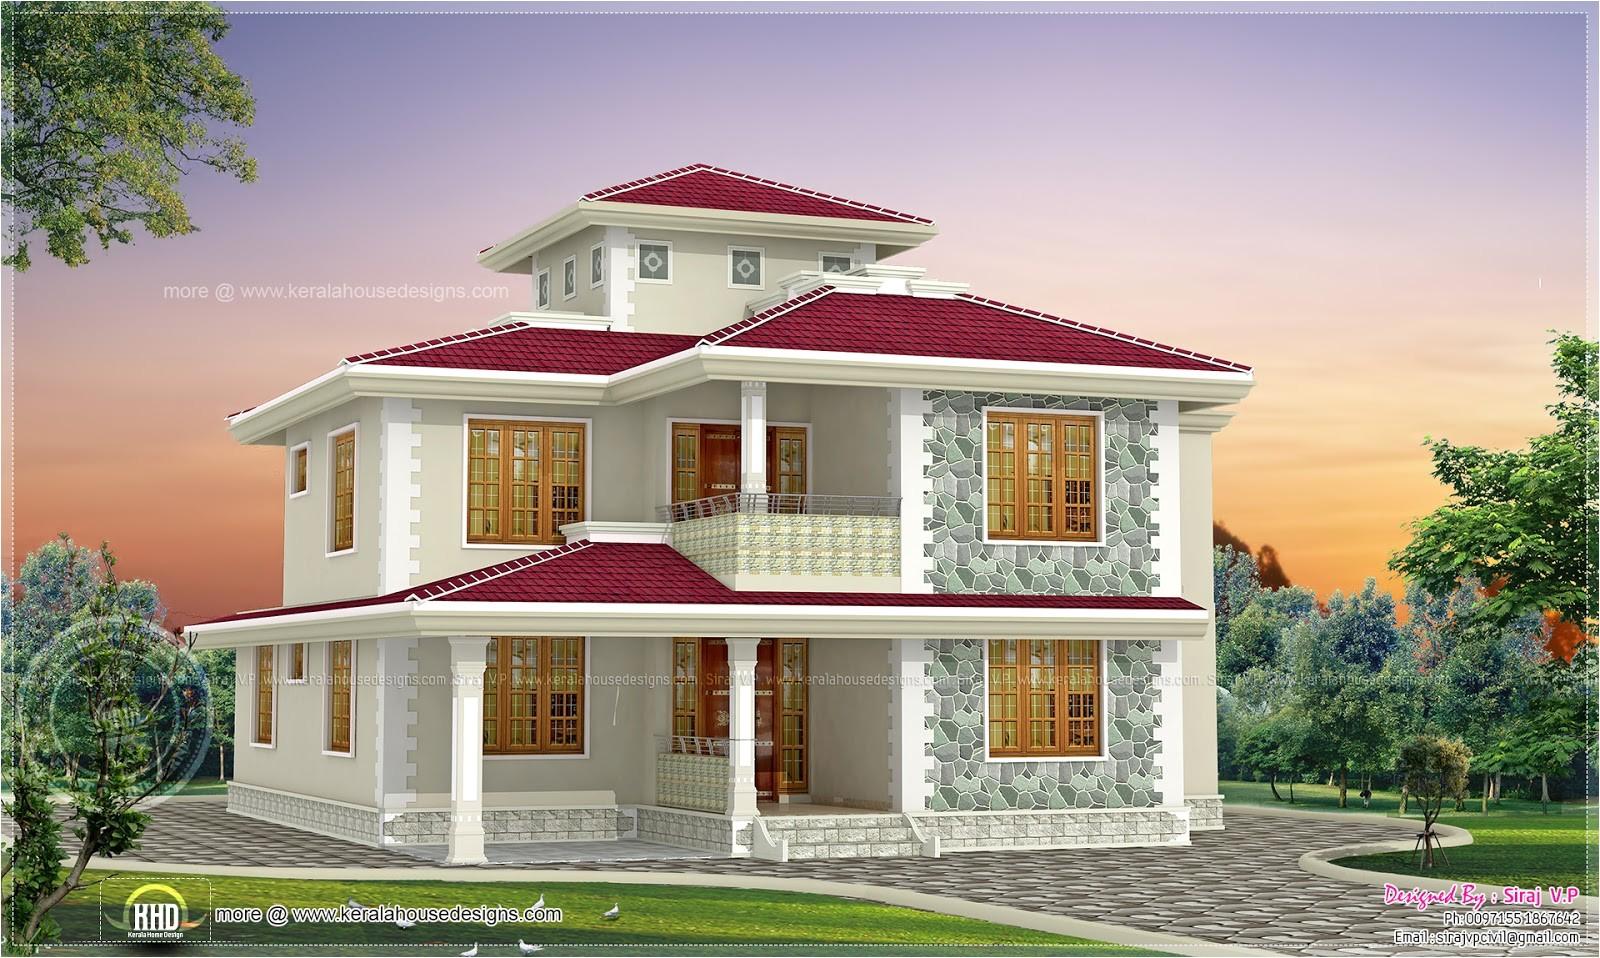 4 bhk kerala style home design